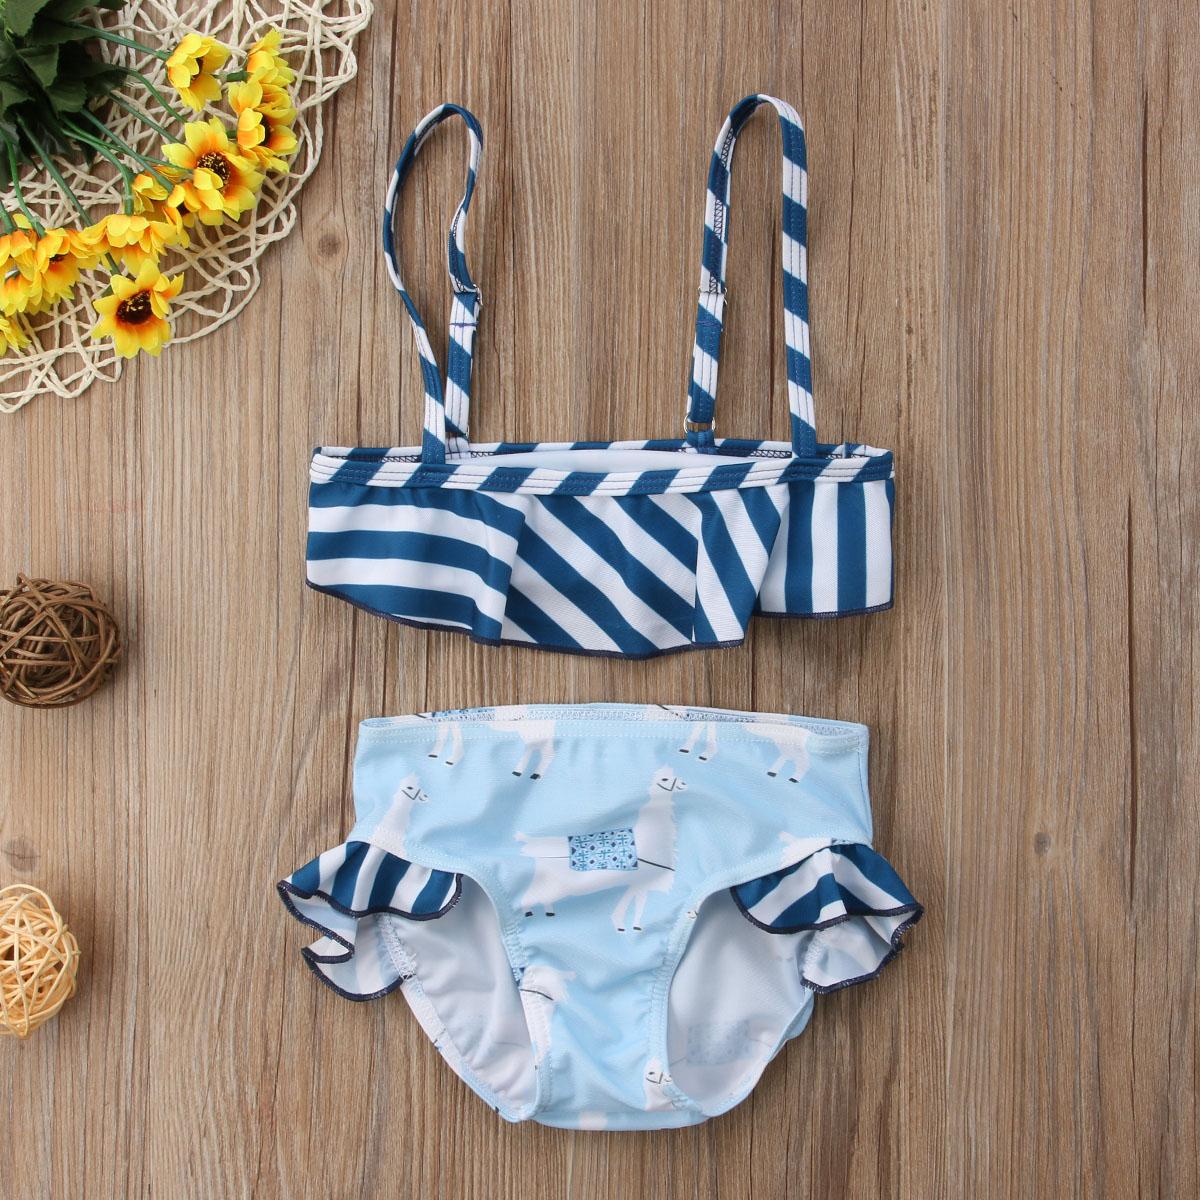 Emmababy Nieuwe Merk Kid Baby Meisjes Alpaca Gestreepte Bikini Set Badpak Badmode Zwemmen Badpak